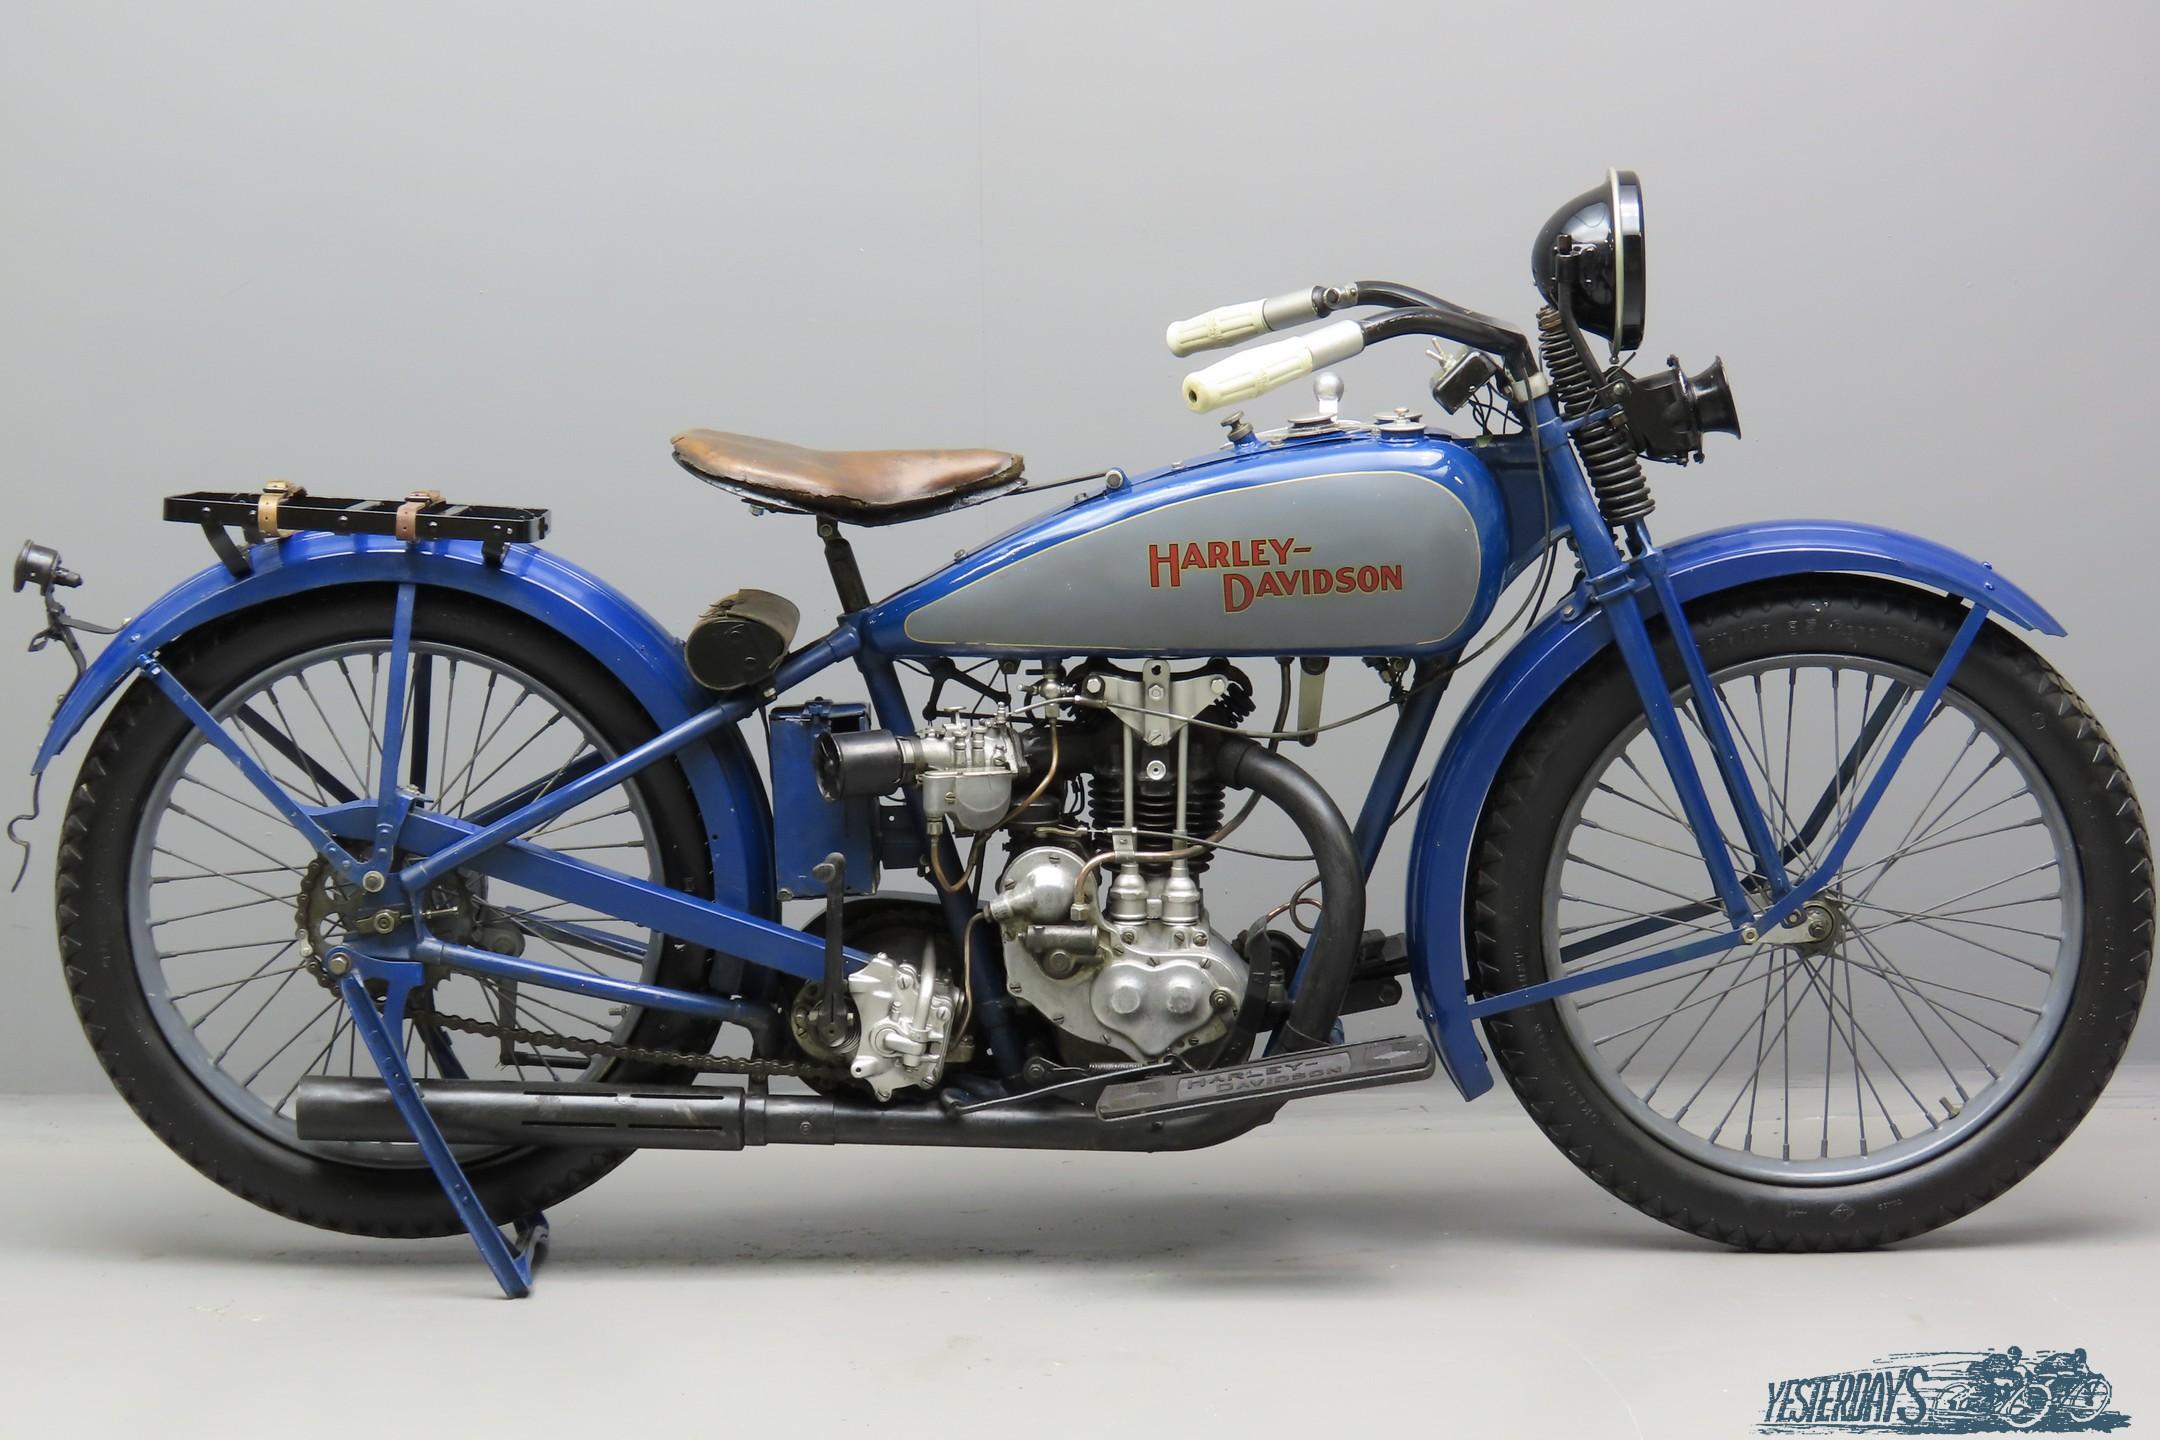 Harley Davidson 1929 Model BA 346cc 1 cyl ohv  3007